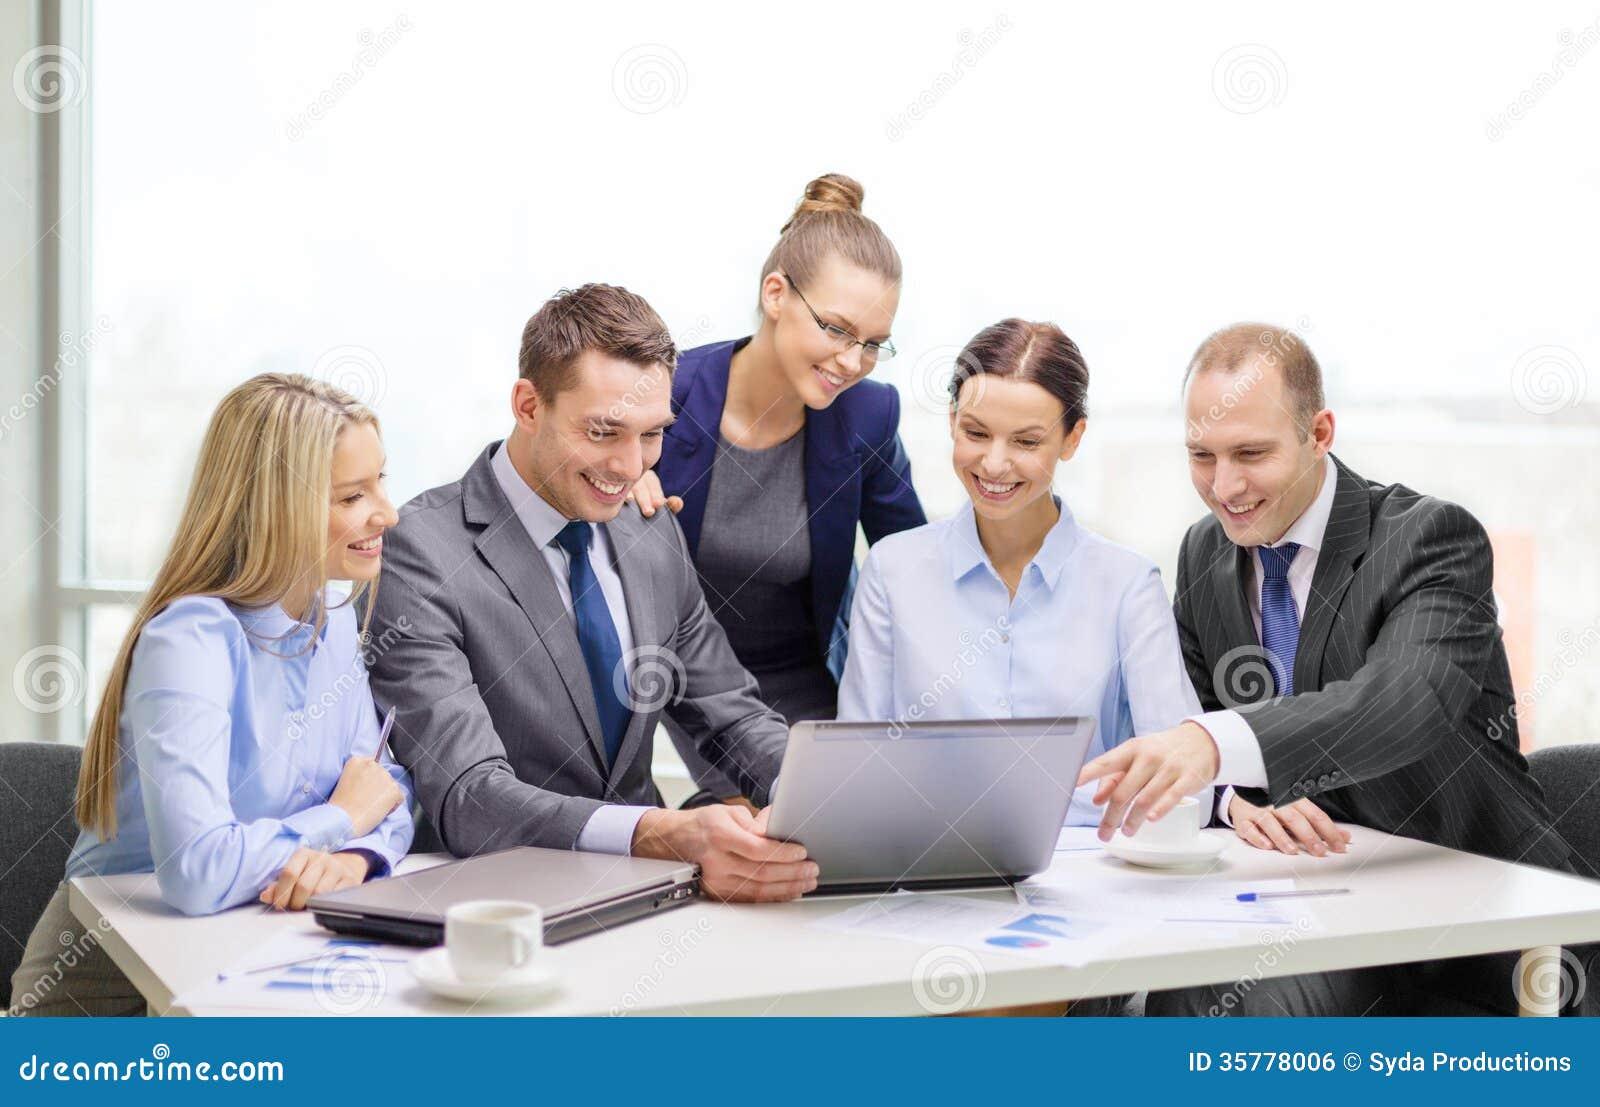 seminar production business plan